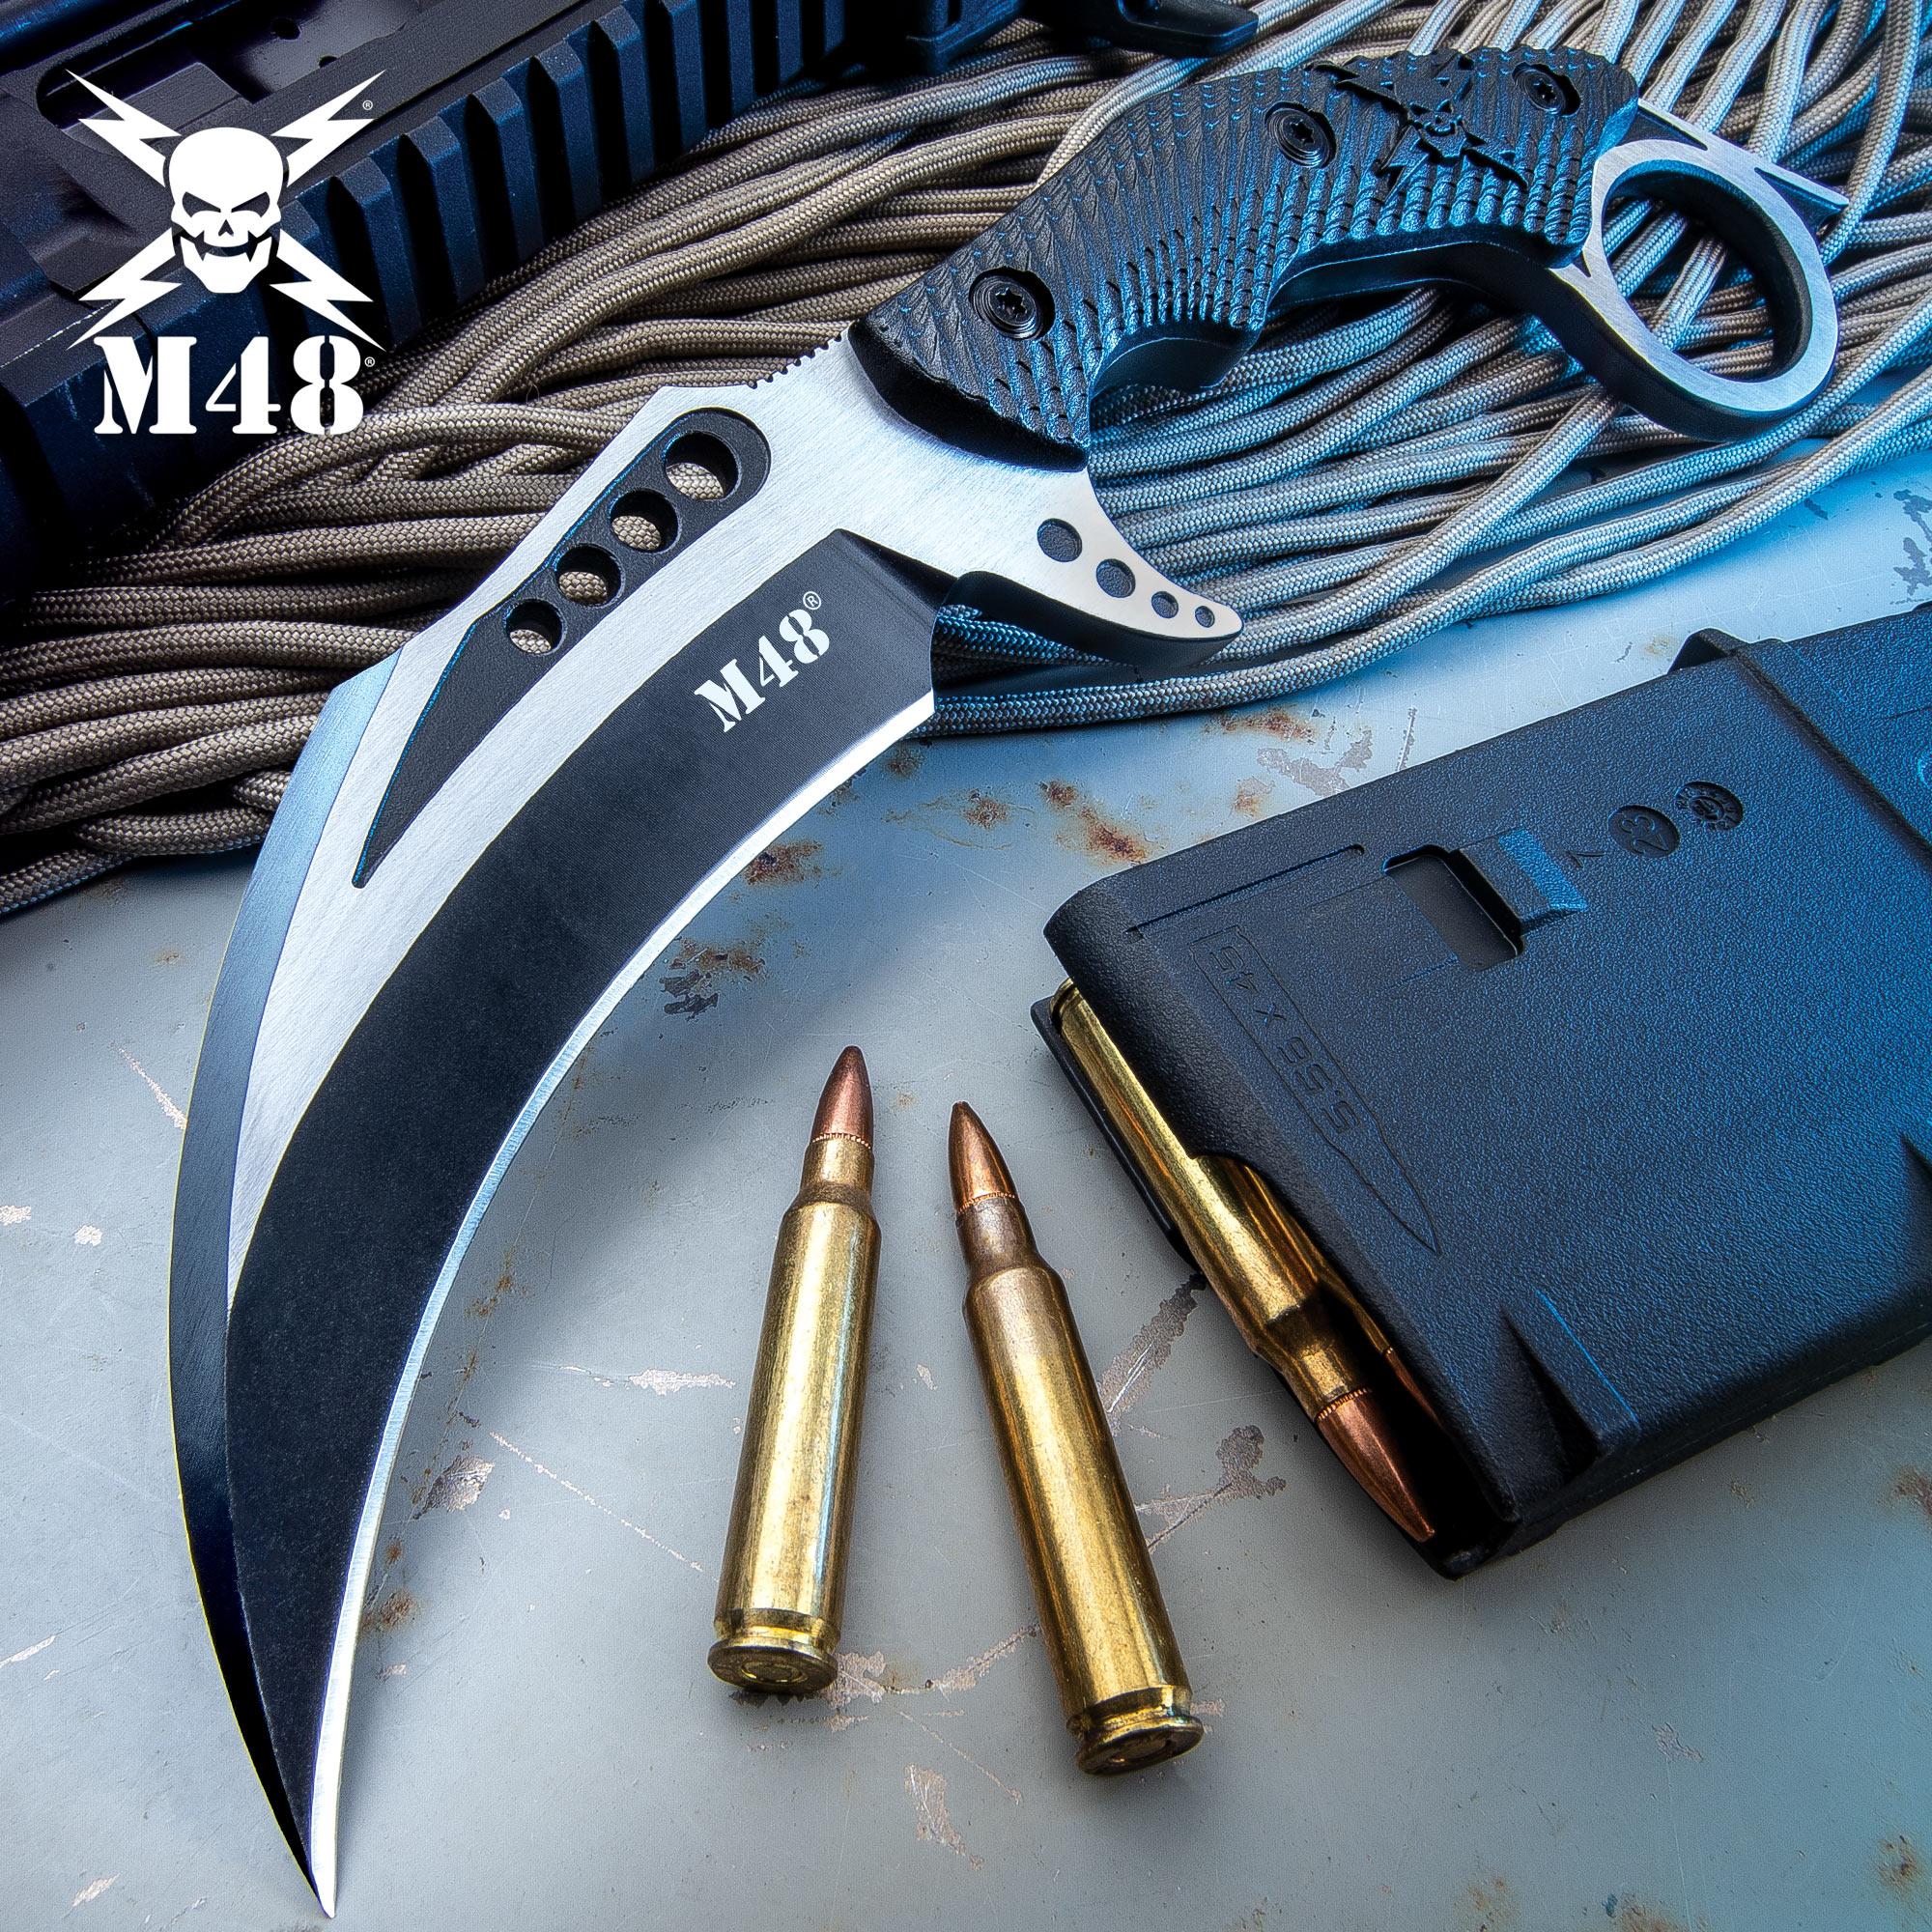 M48 Liberator Falcon Karambit Knife And Sheath - 2Cr13